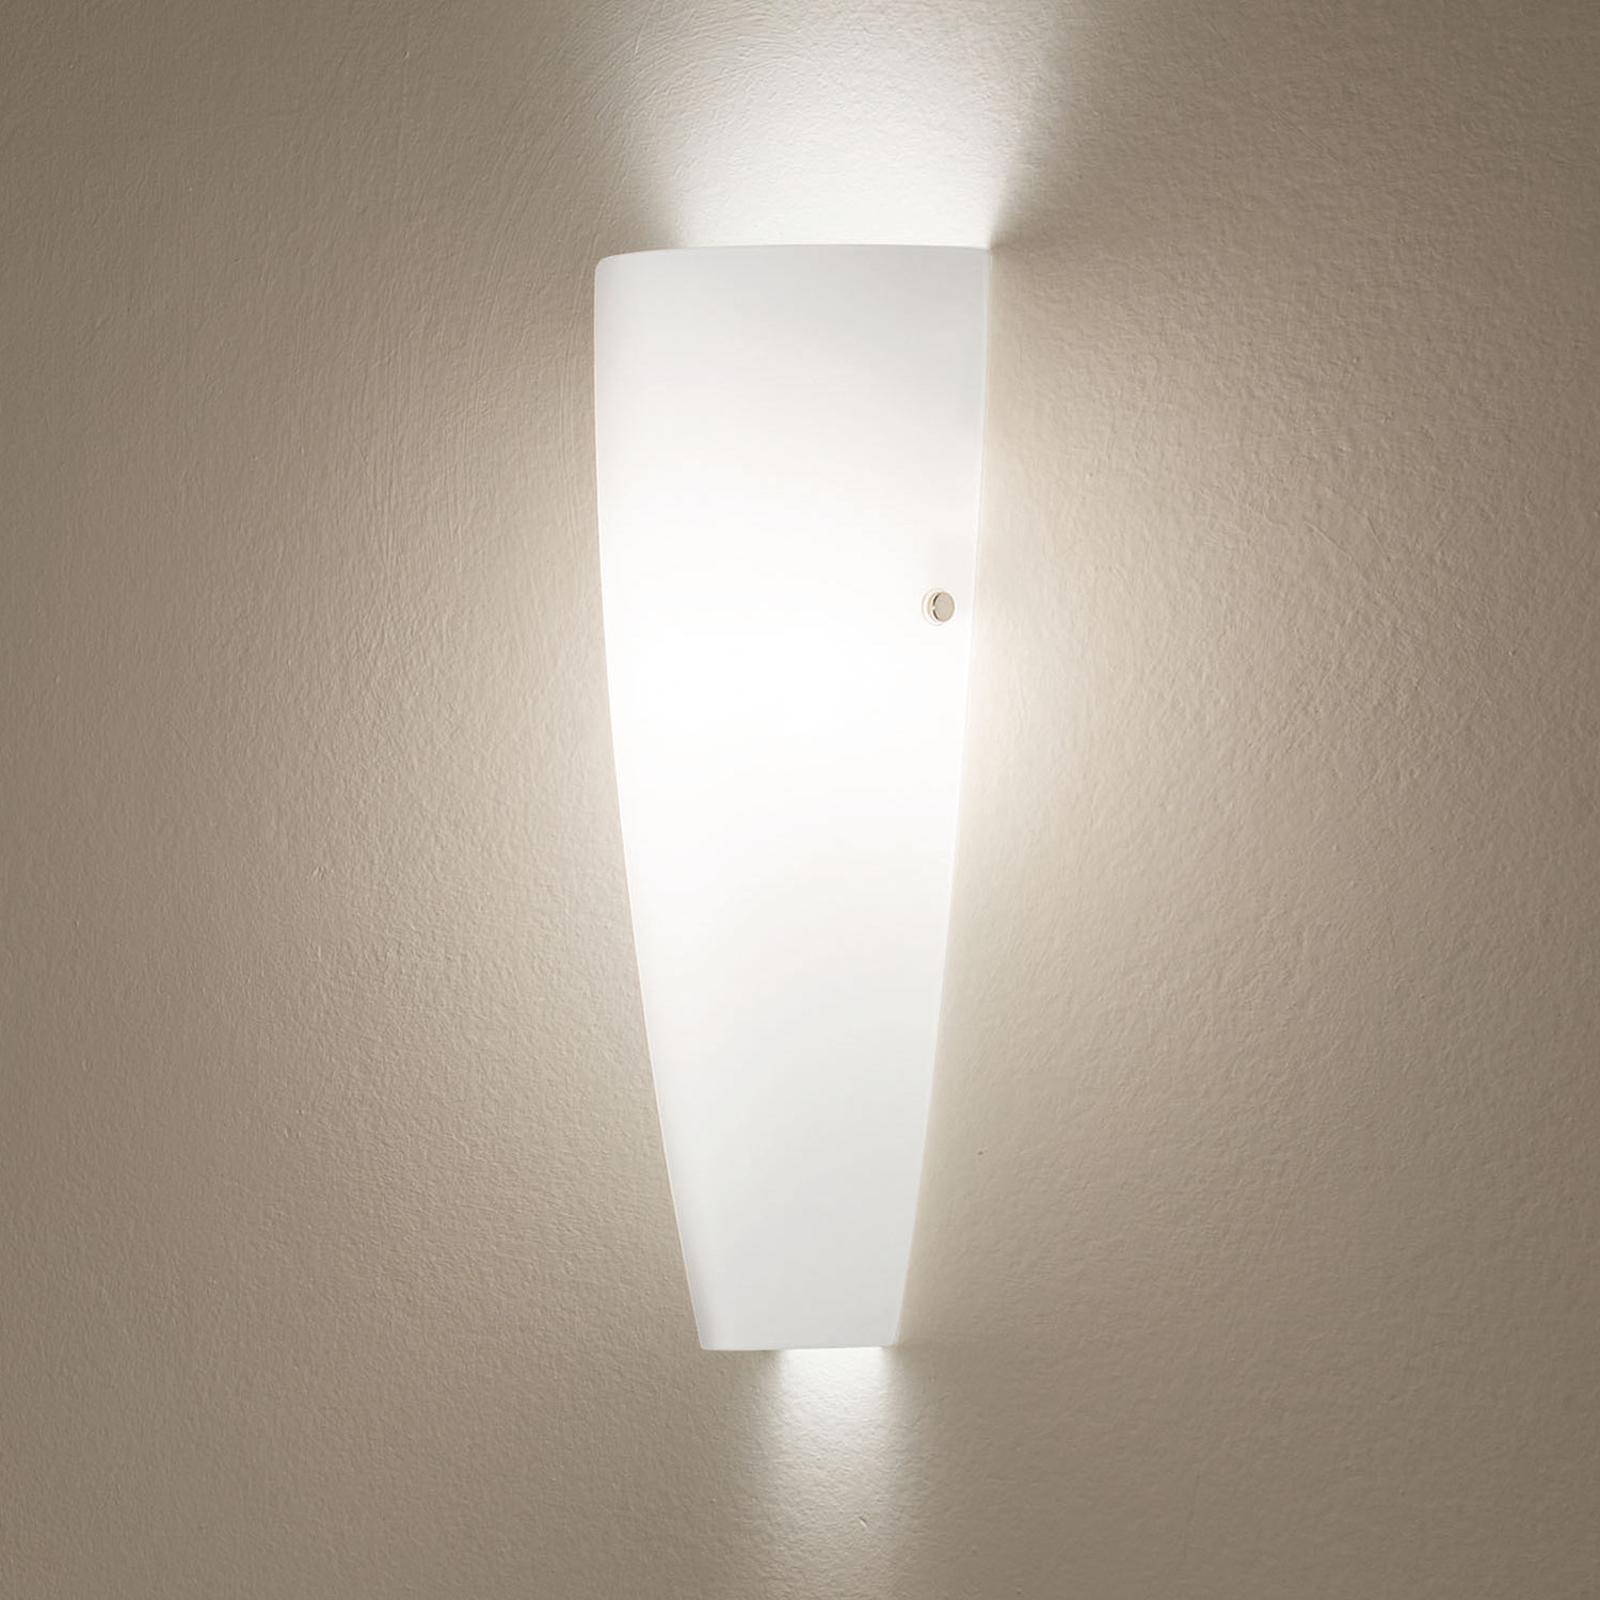 White wall light Dedalo IP44_3501195_1